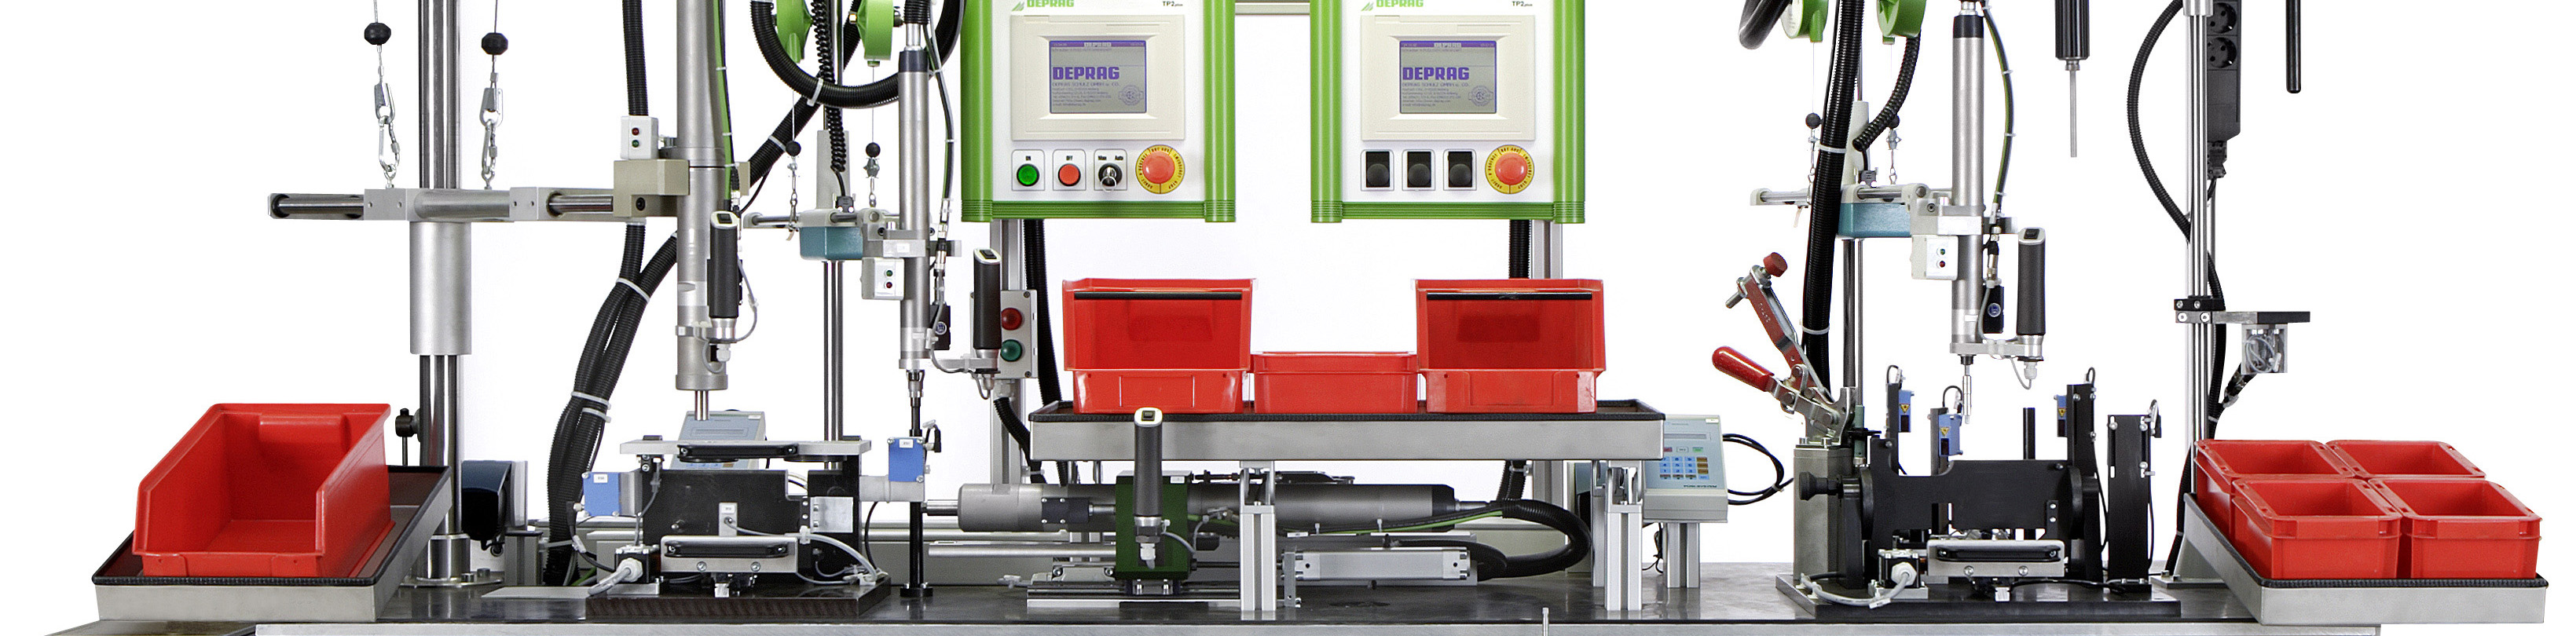 qc conveyor denver colorado utah rg-tech